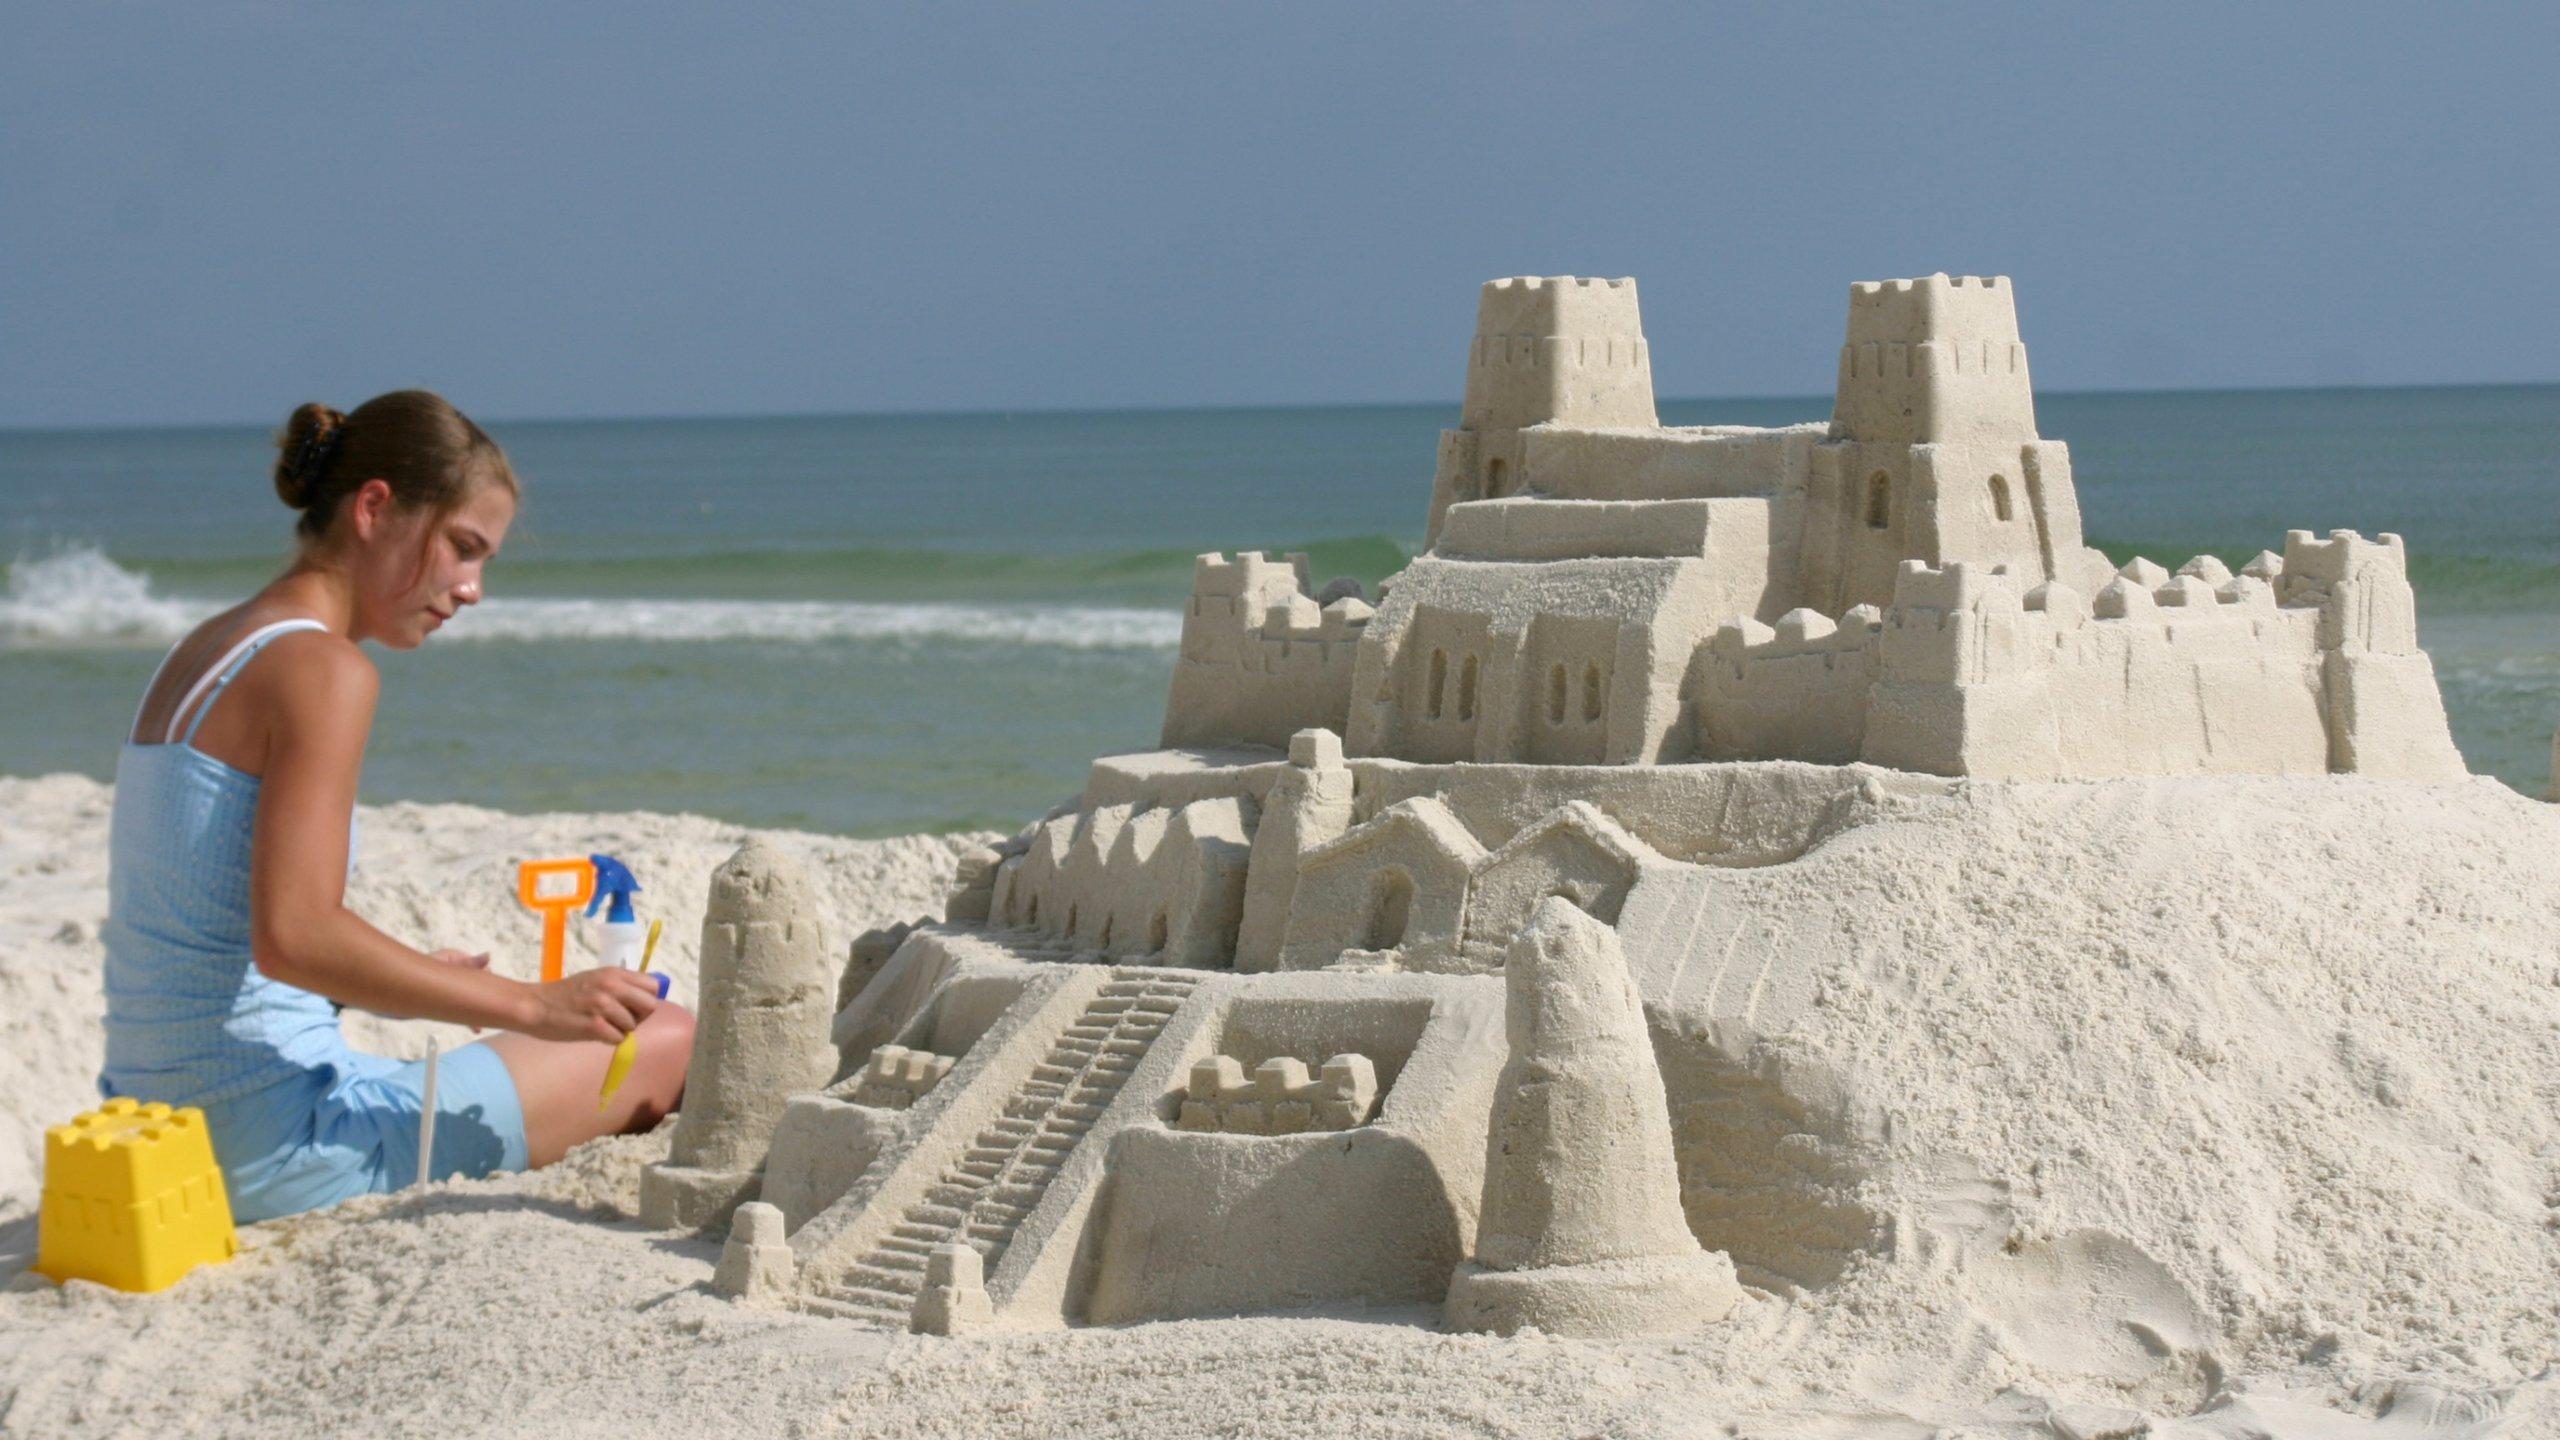 10 Best Family Hotels In Orange Beach